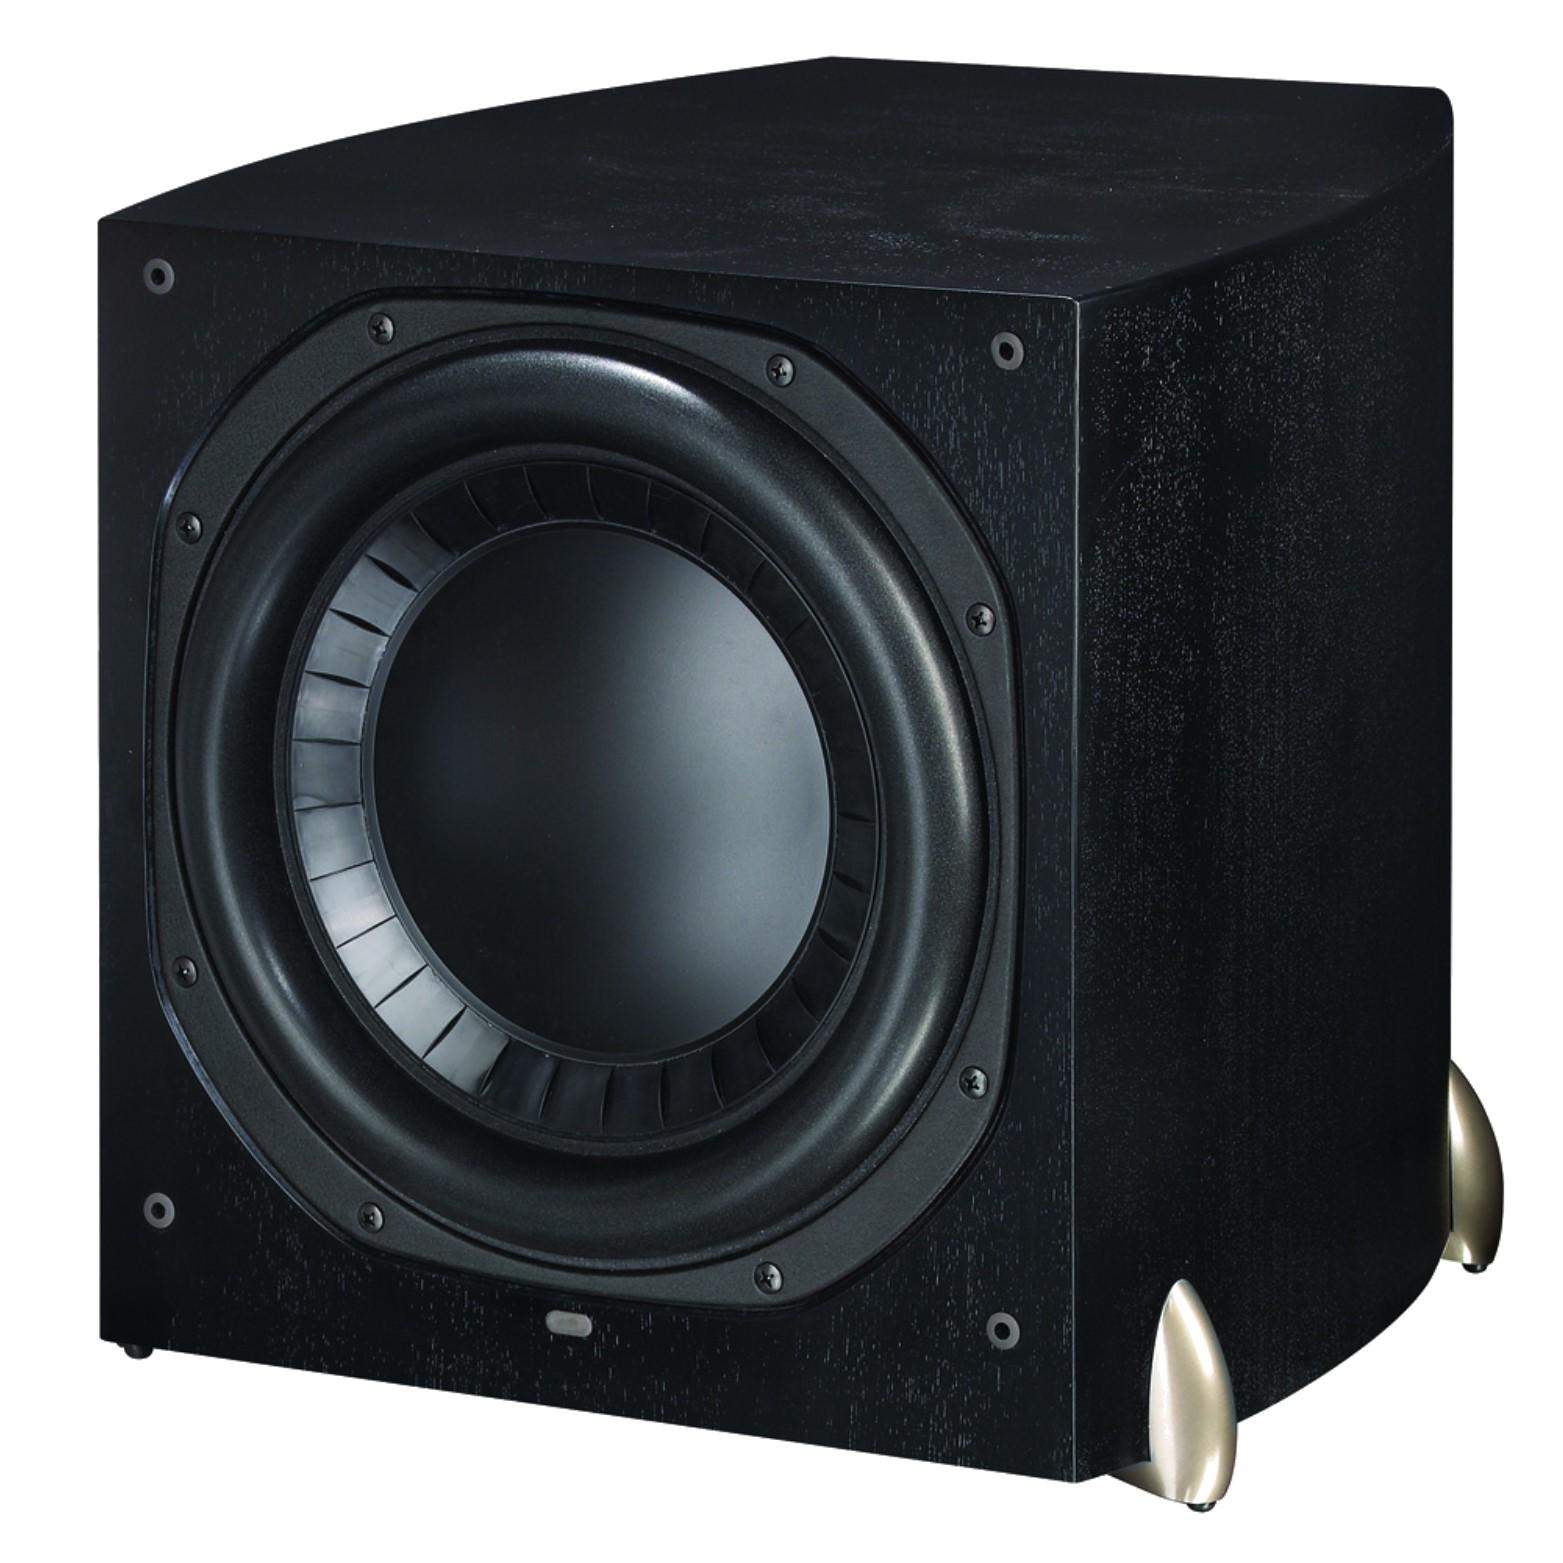 paradigm sub 15 reference 15 powered subwoofer ebay. Black Bedroom Furniture Sets. Home Design Ideas